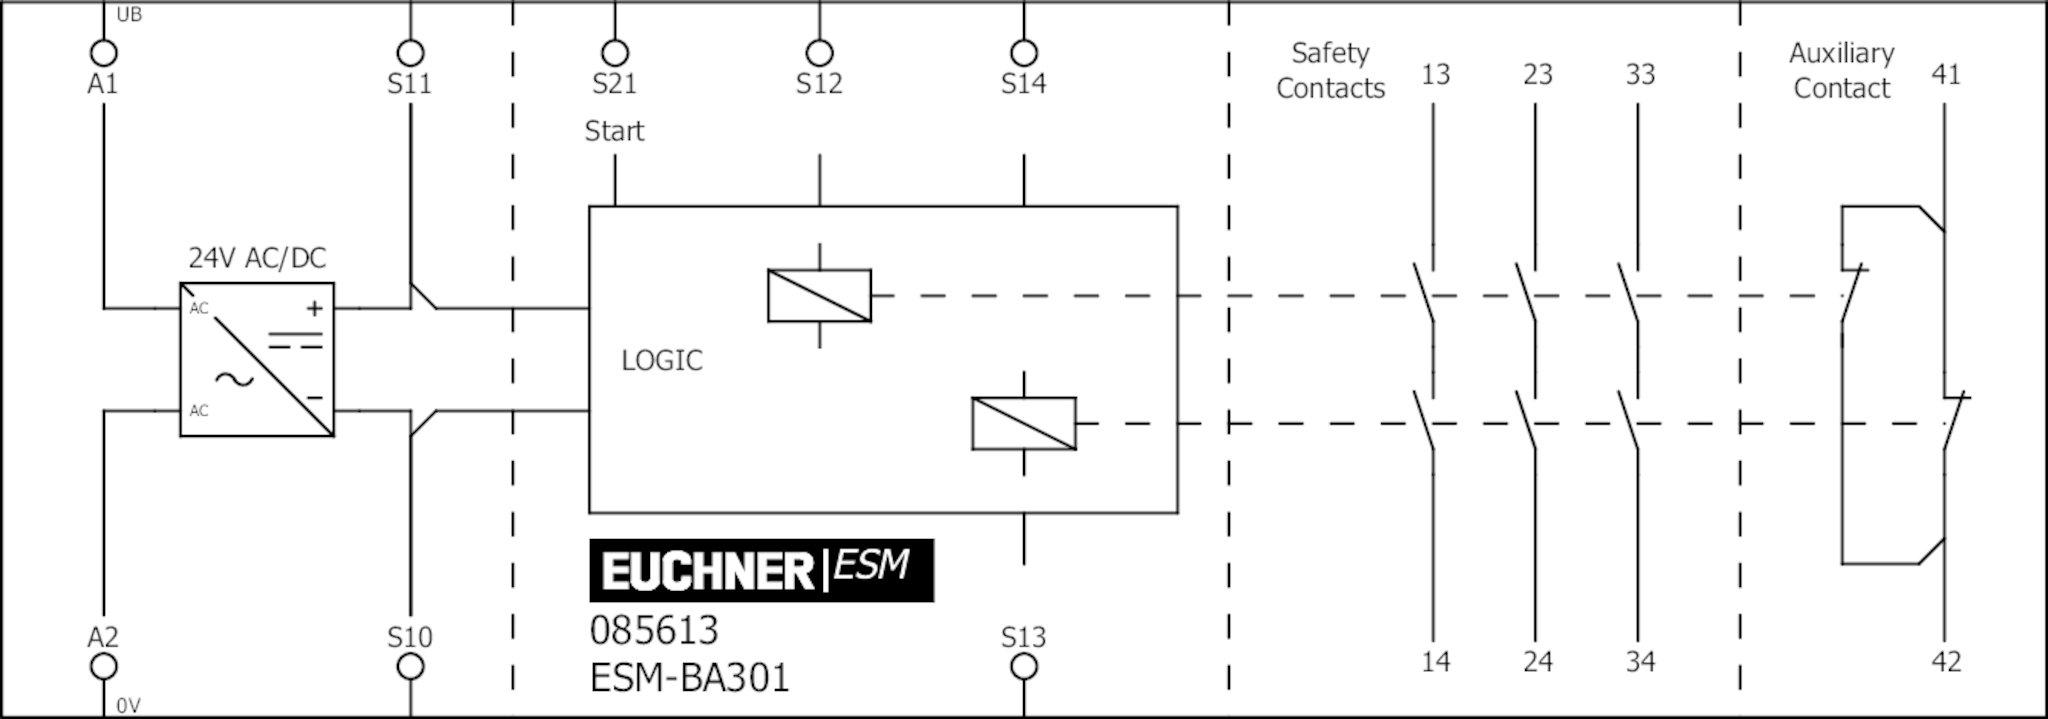 Safety Cat 3 Wiring Diagram